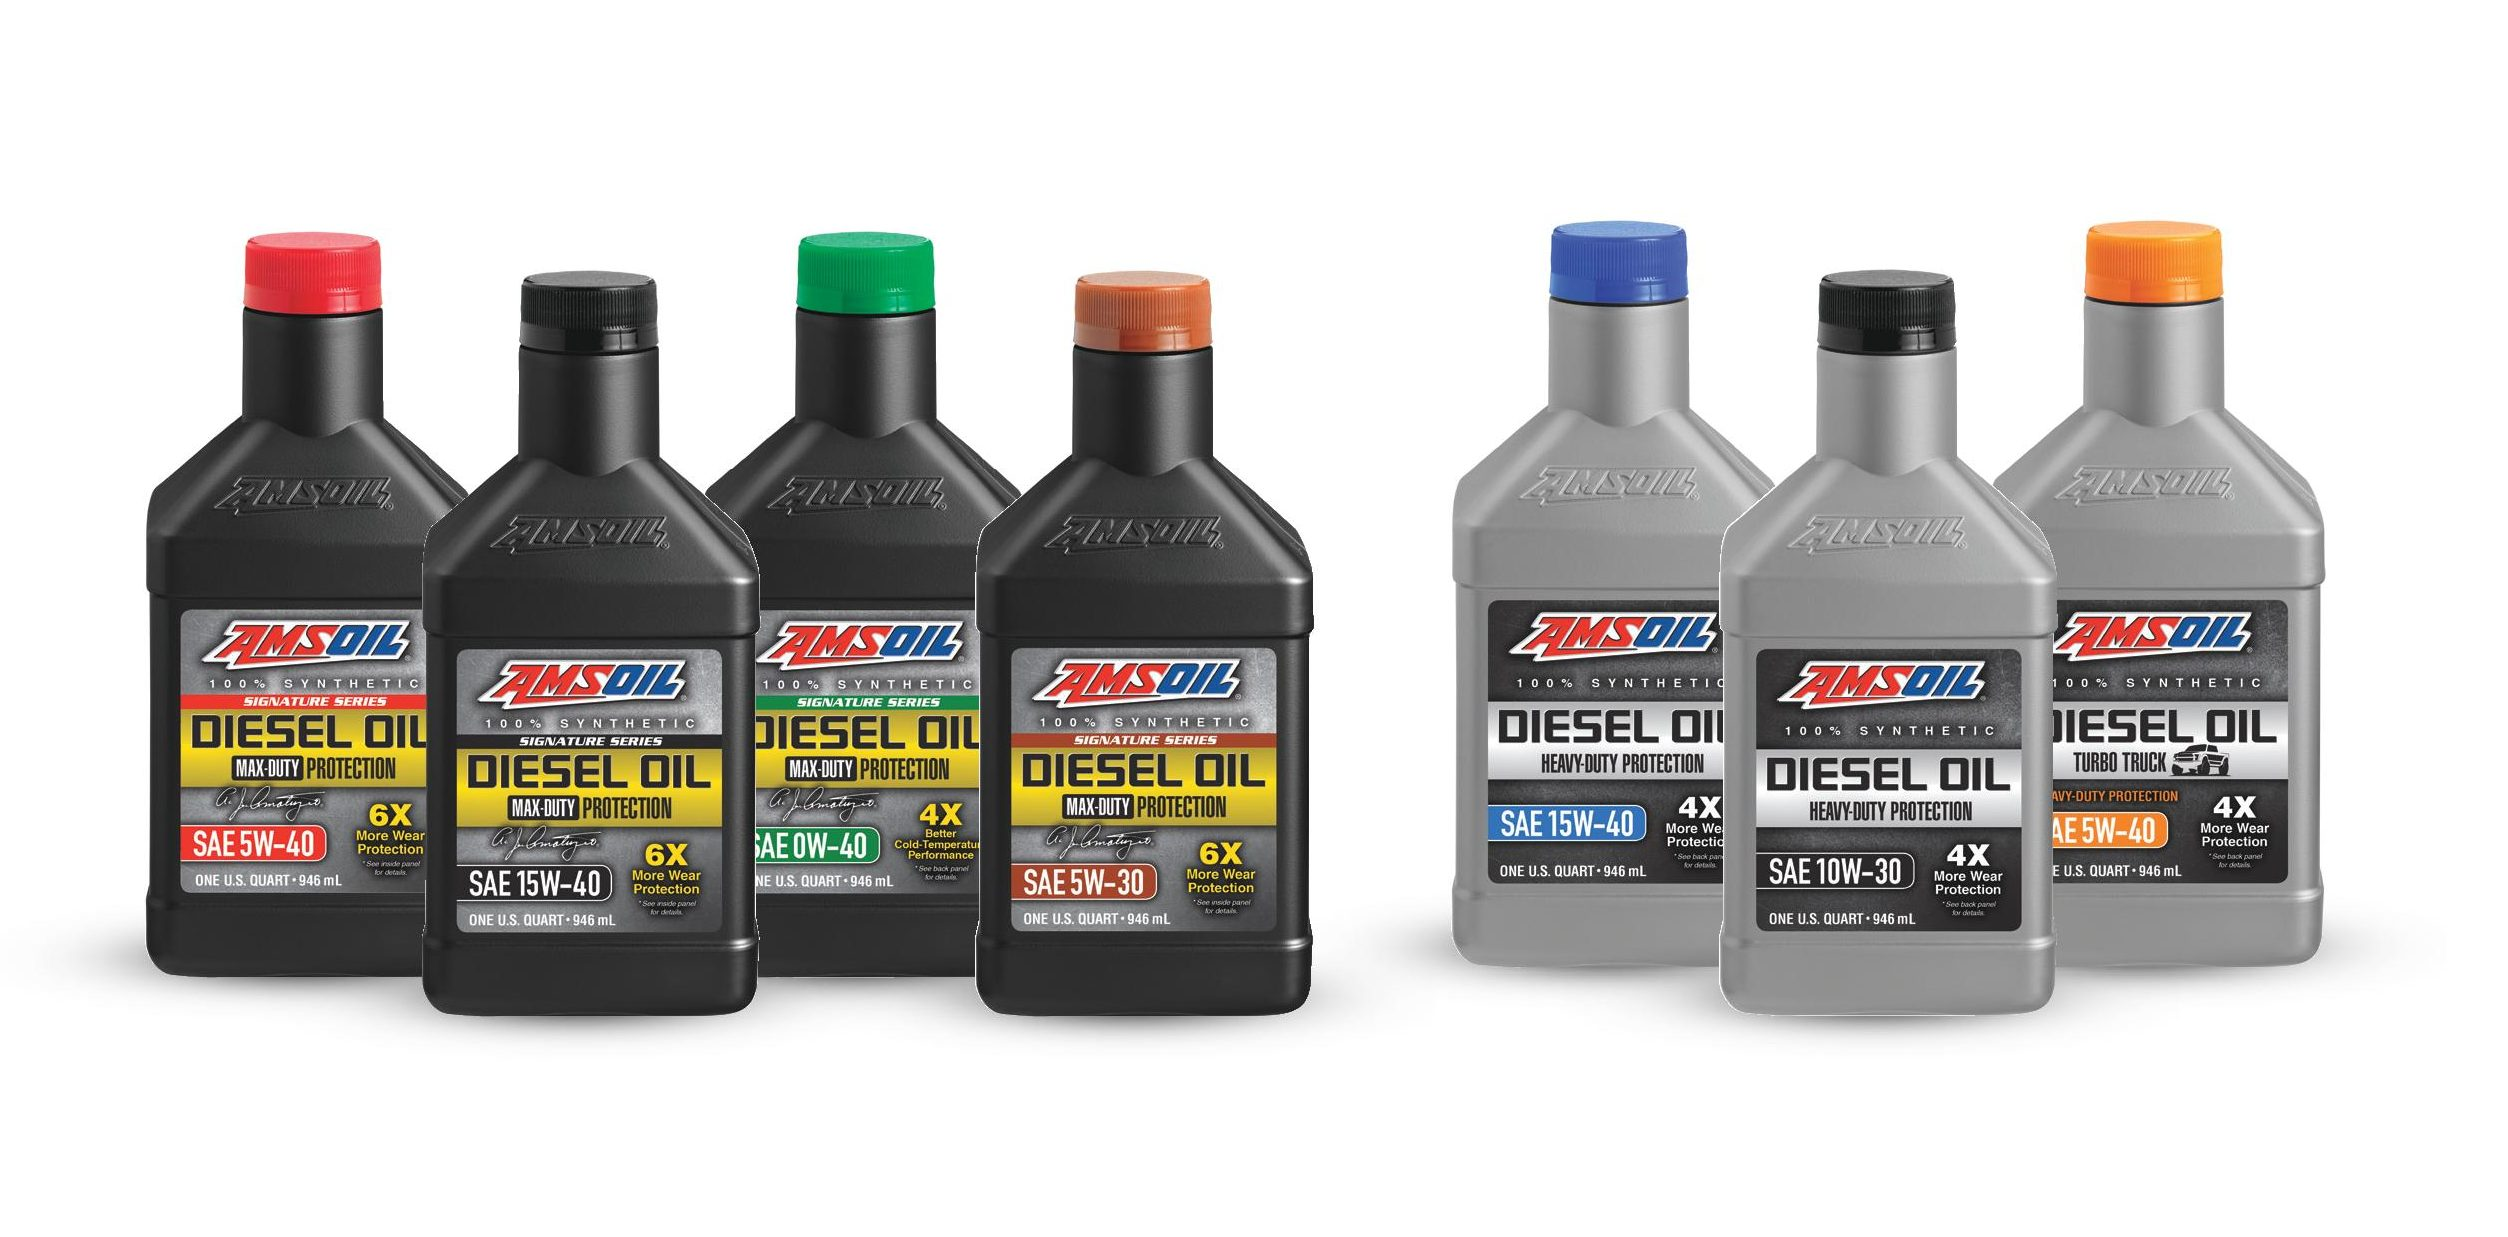 New Diesel Oils - AMSOIL 2017